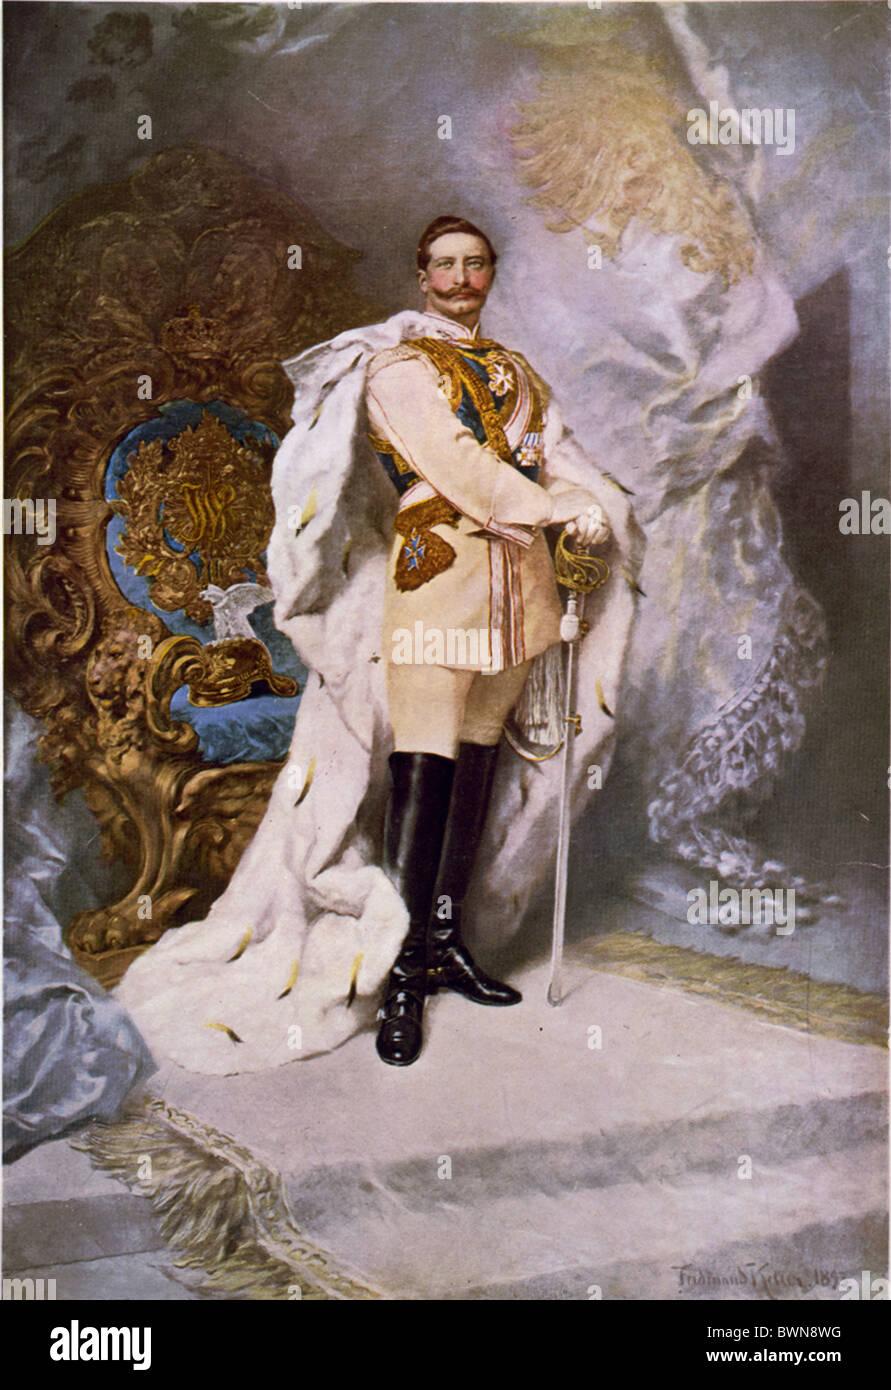 German Emperor Wilhelm II portrait by Ferdinand Keller 1893 Oil on canvas history historical historic paintin - Stock Image